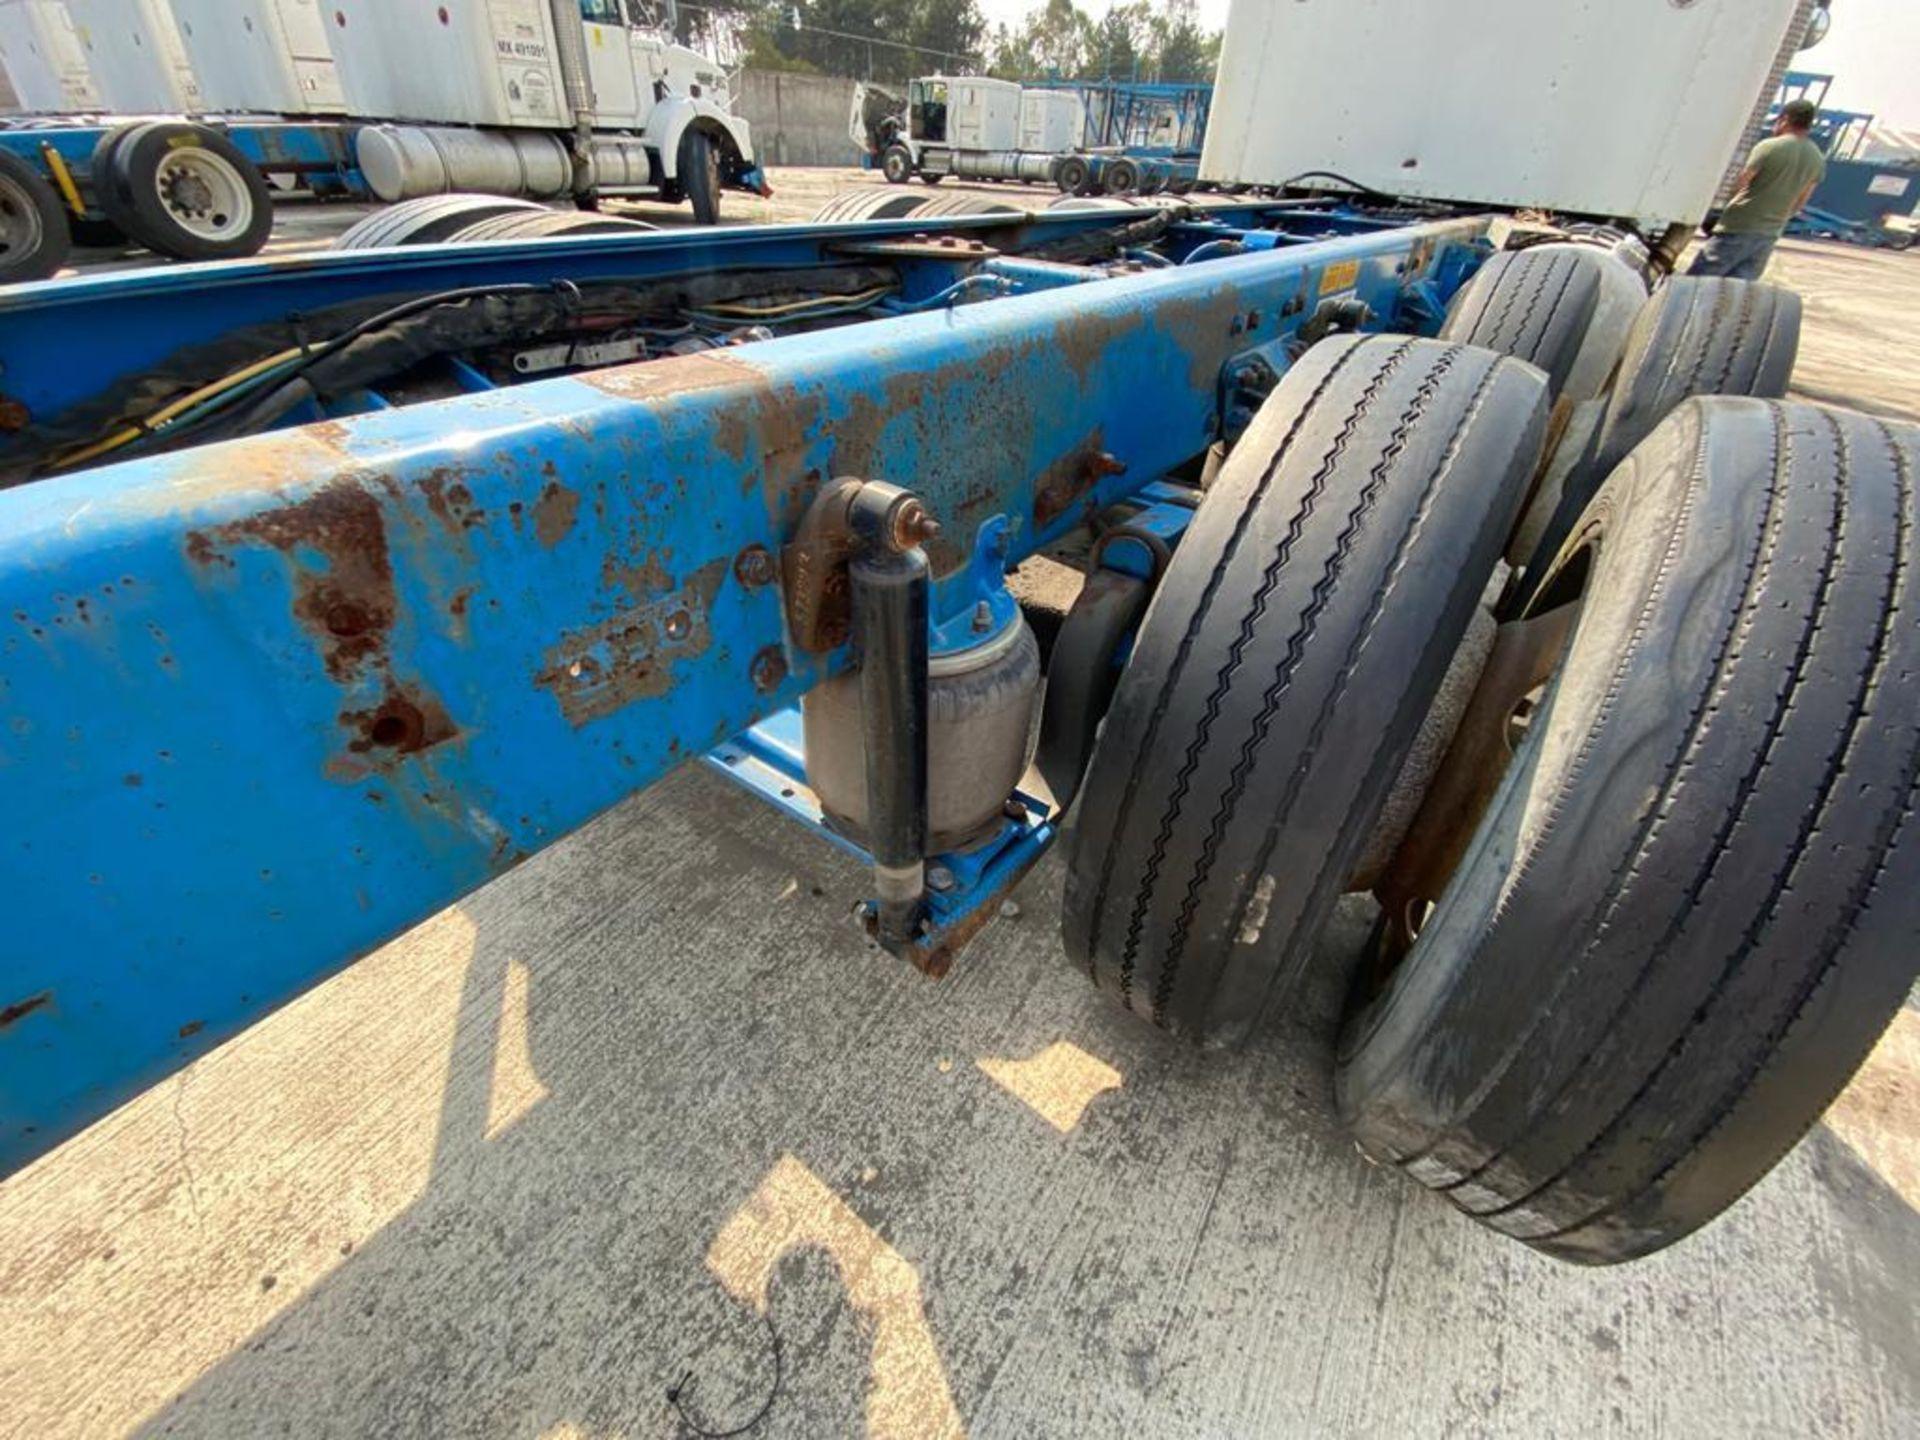 1999 Kenworth Sleeper truck tractor, standard transmission of 18 speeds - Image 23 of 75